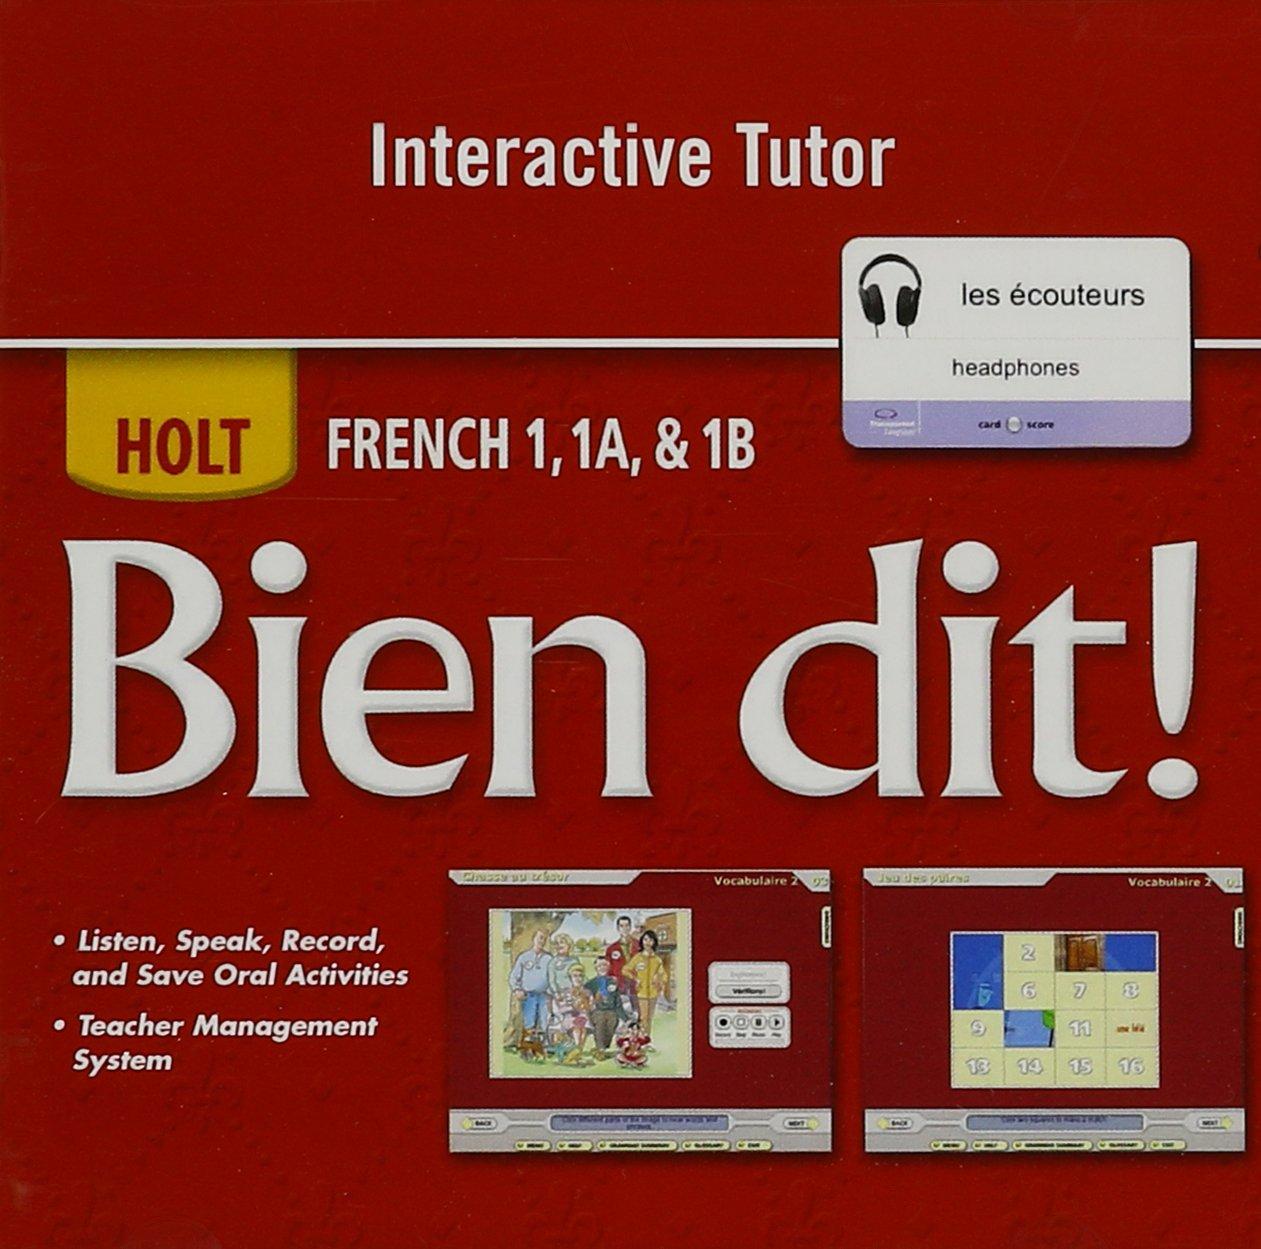 Amazon.com: Bien dit!: Interactive DVD Tutor Level 1A/1B/1 (9780030797378):  RINEHART AND WINSTON HOLT: Books